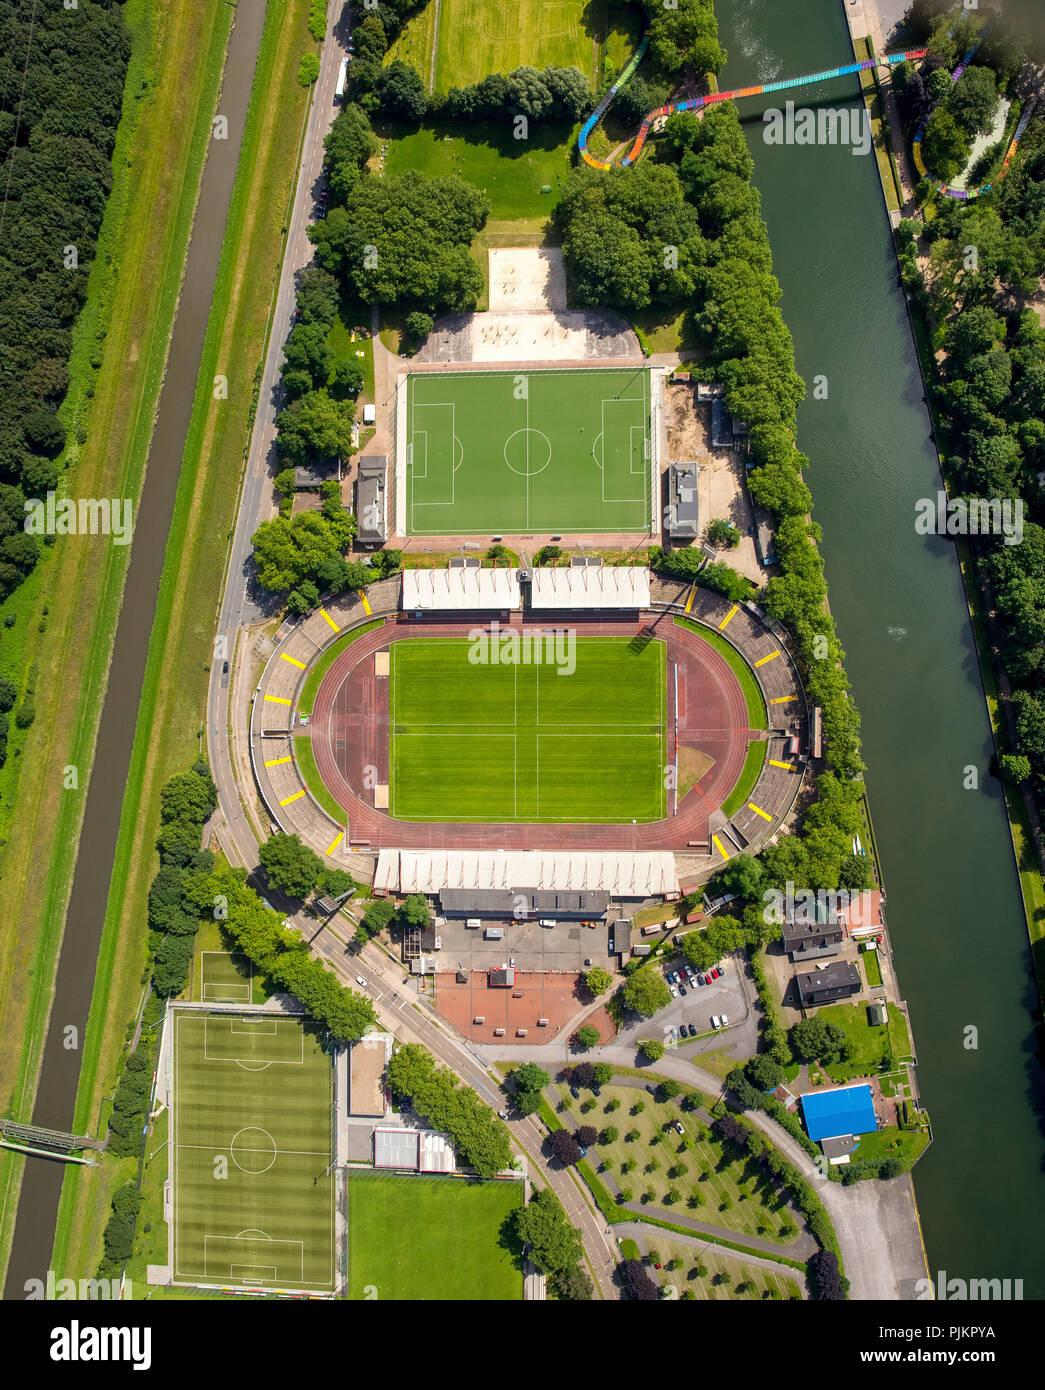 Stadium Niederrhein, SC Rot-Weiß Oberhausen eV, TC Sterkrade 1869 eV, Emscher Rhein-Herne-Canal, Oberhausen, Ruhr area, North Rhine-Westphalia, Germany - Stock Image